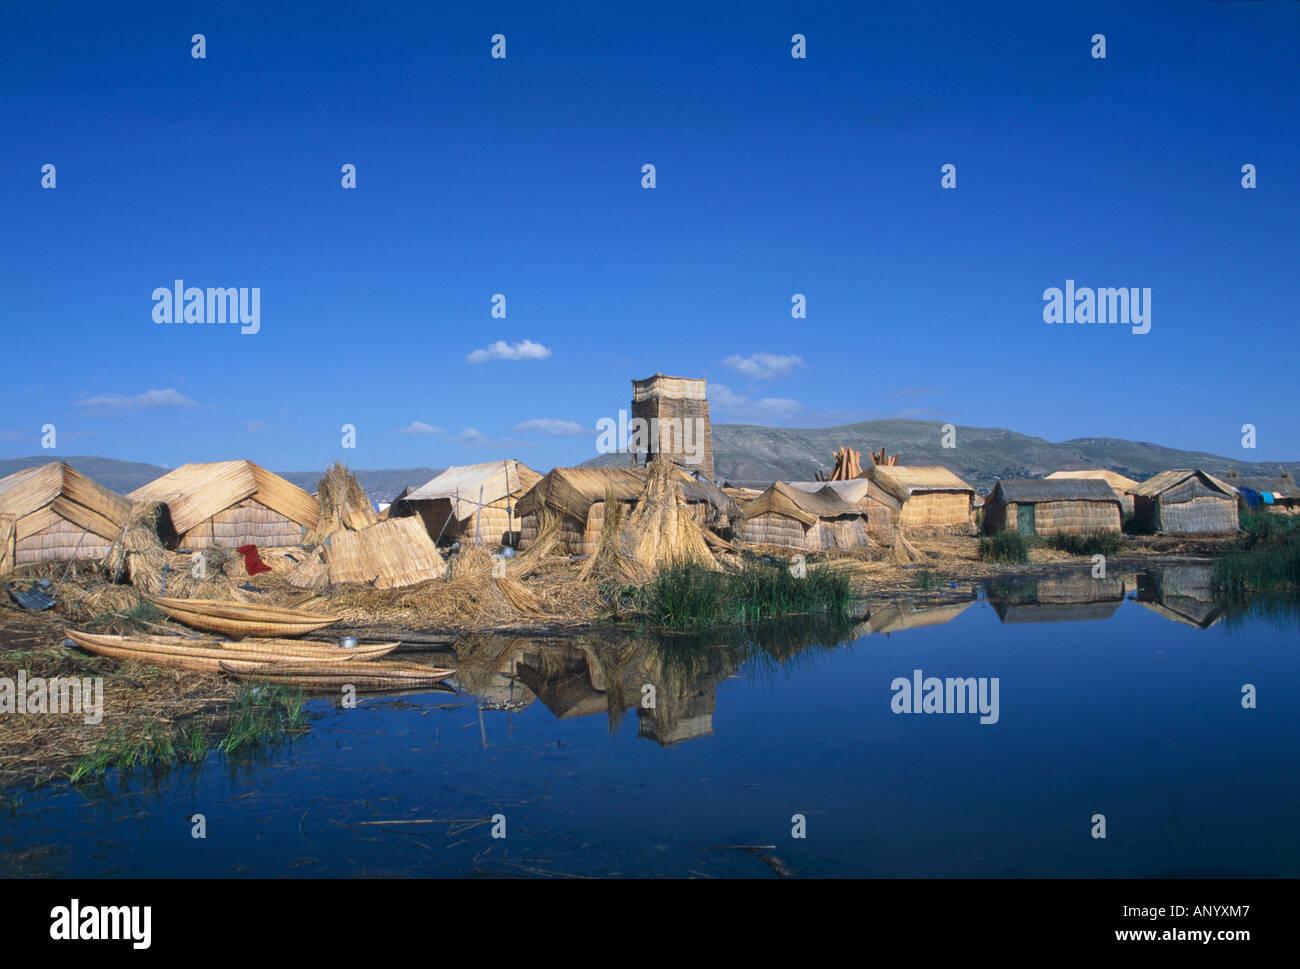 floating island made by totora reed lake titicaca peru bolivia - Stock Image